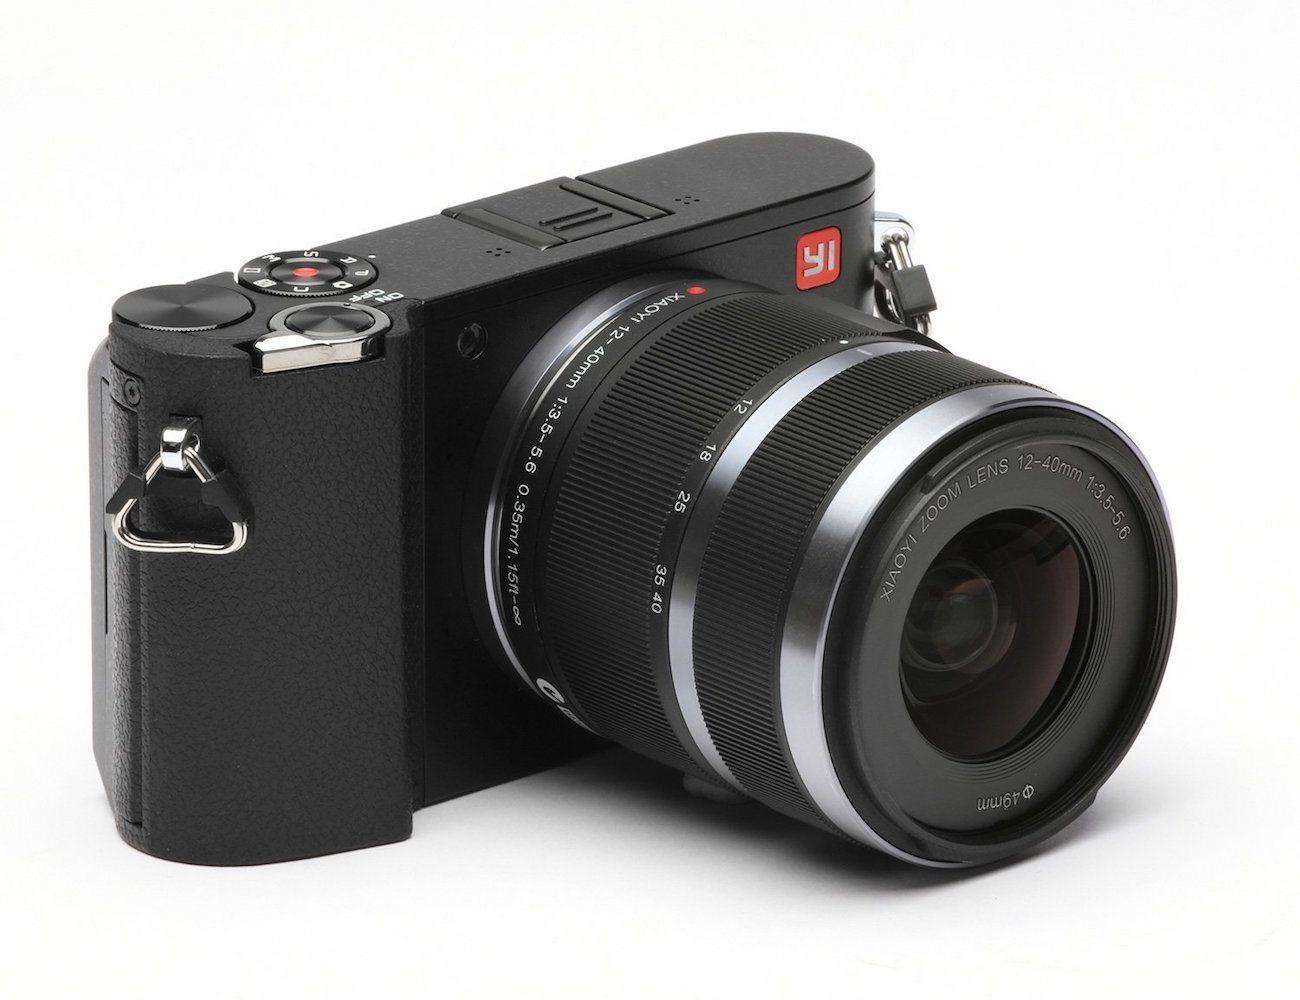 YI M1 4K Mirrorless Digital Camera